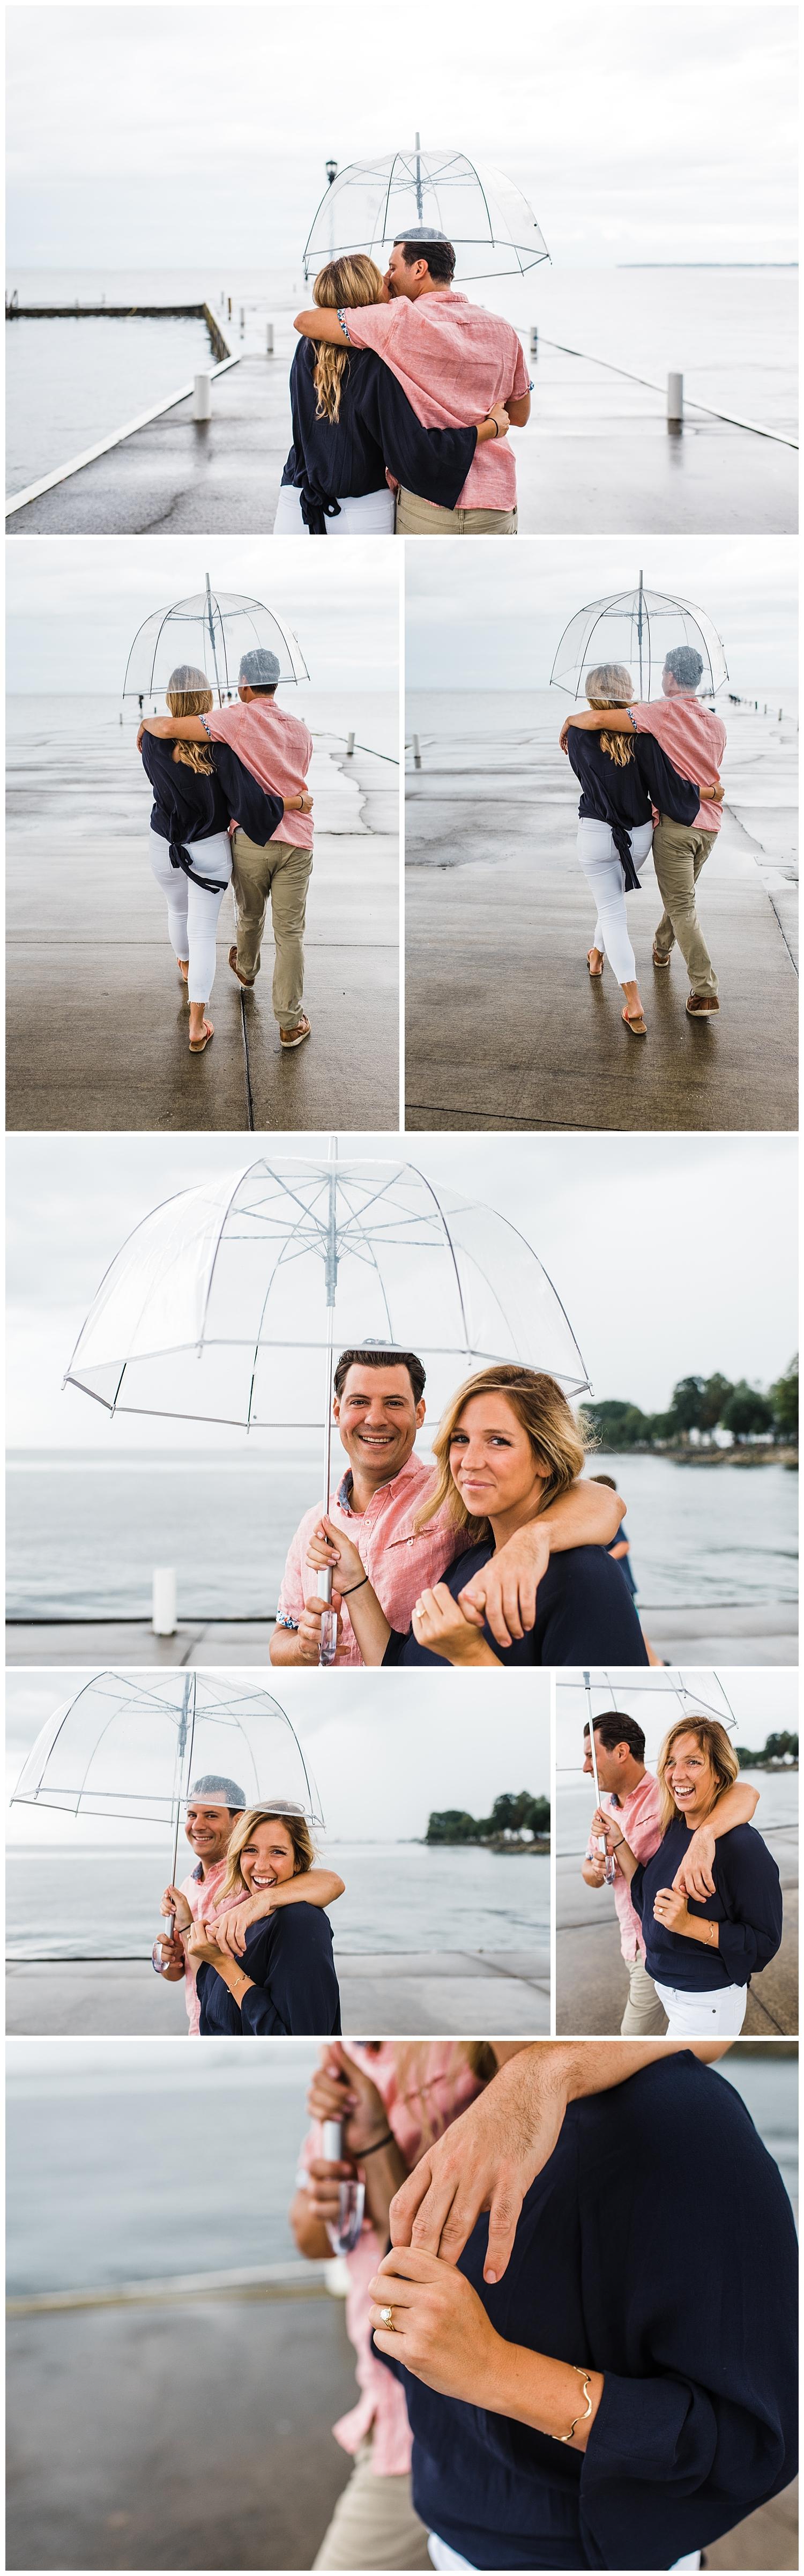 Easterday Creative   Adventurous wedding photographer and storyteller   Marblehead Lakeside Engagement Session